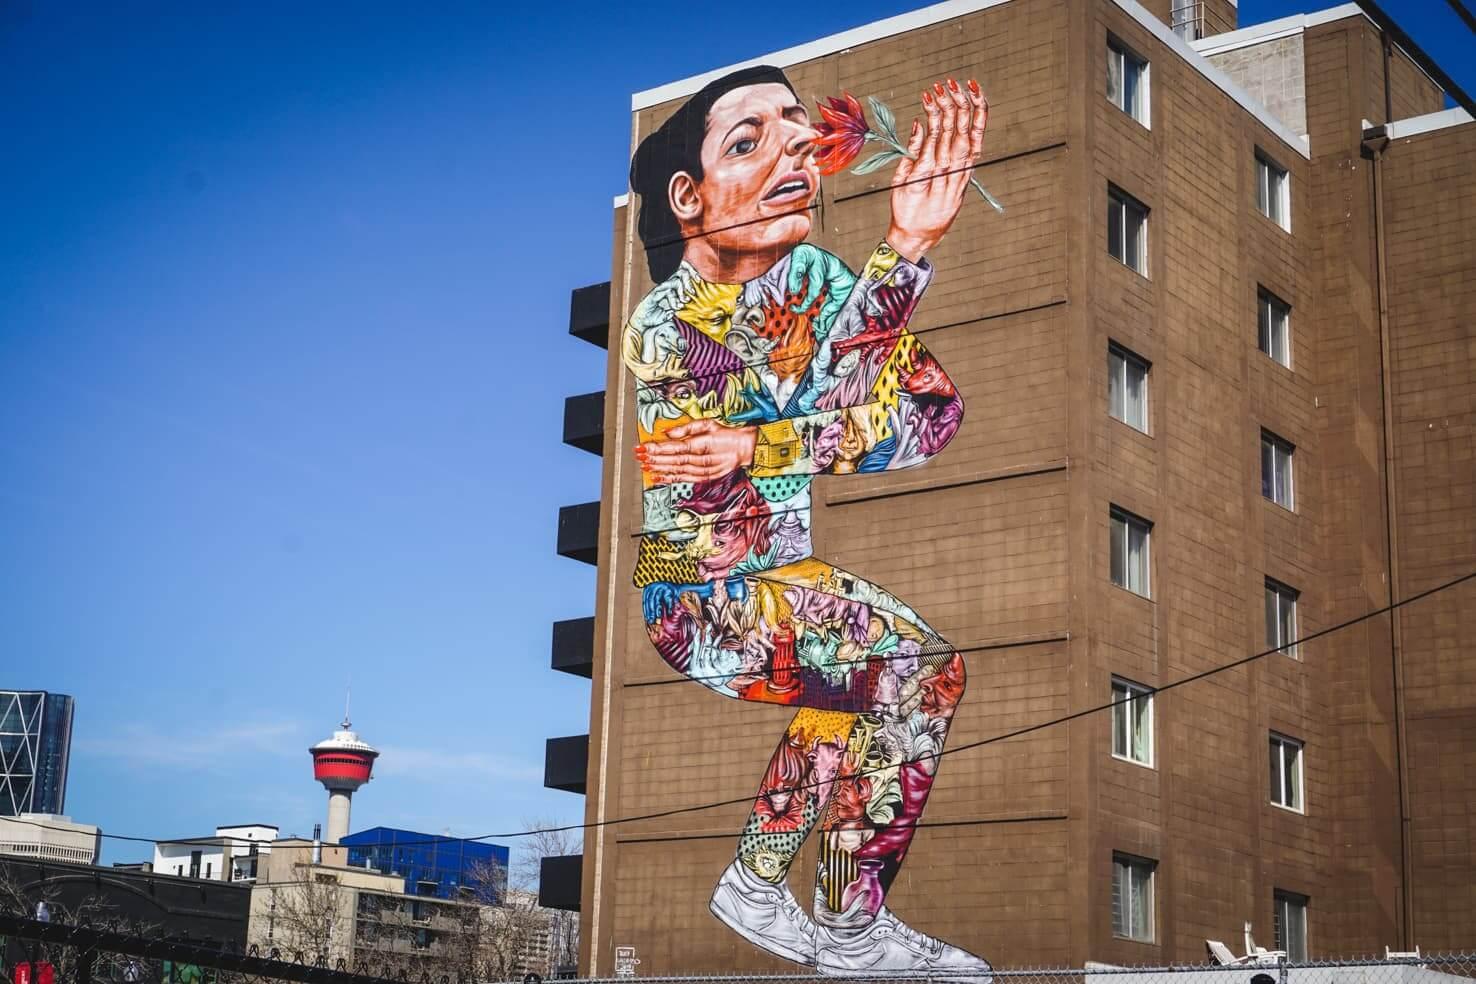 Murals in Calgary